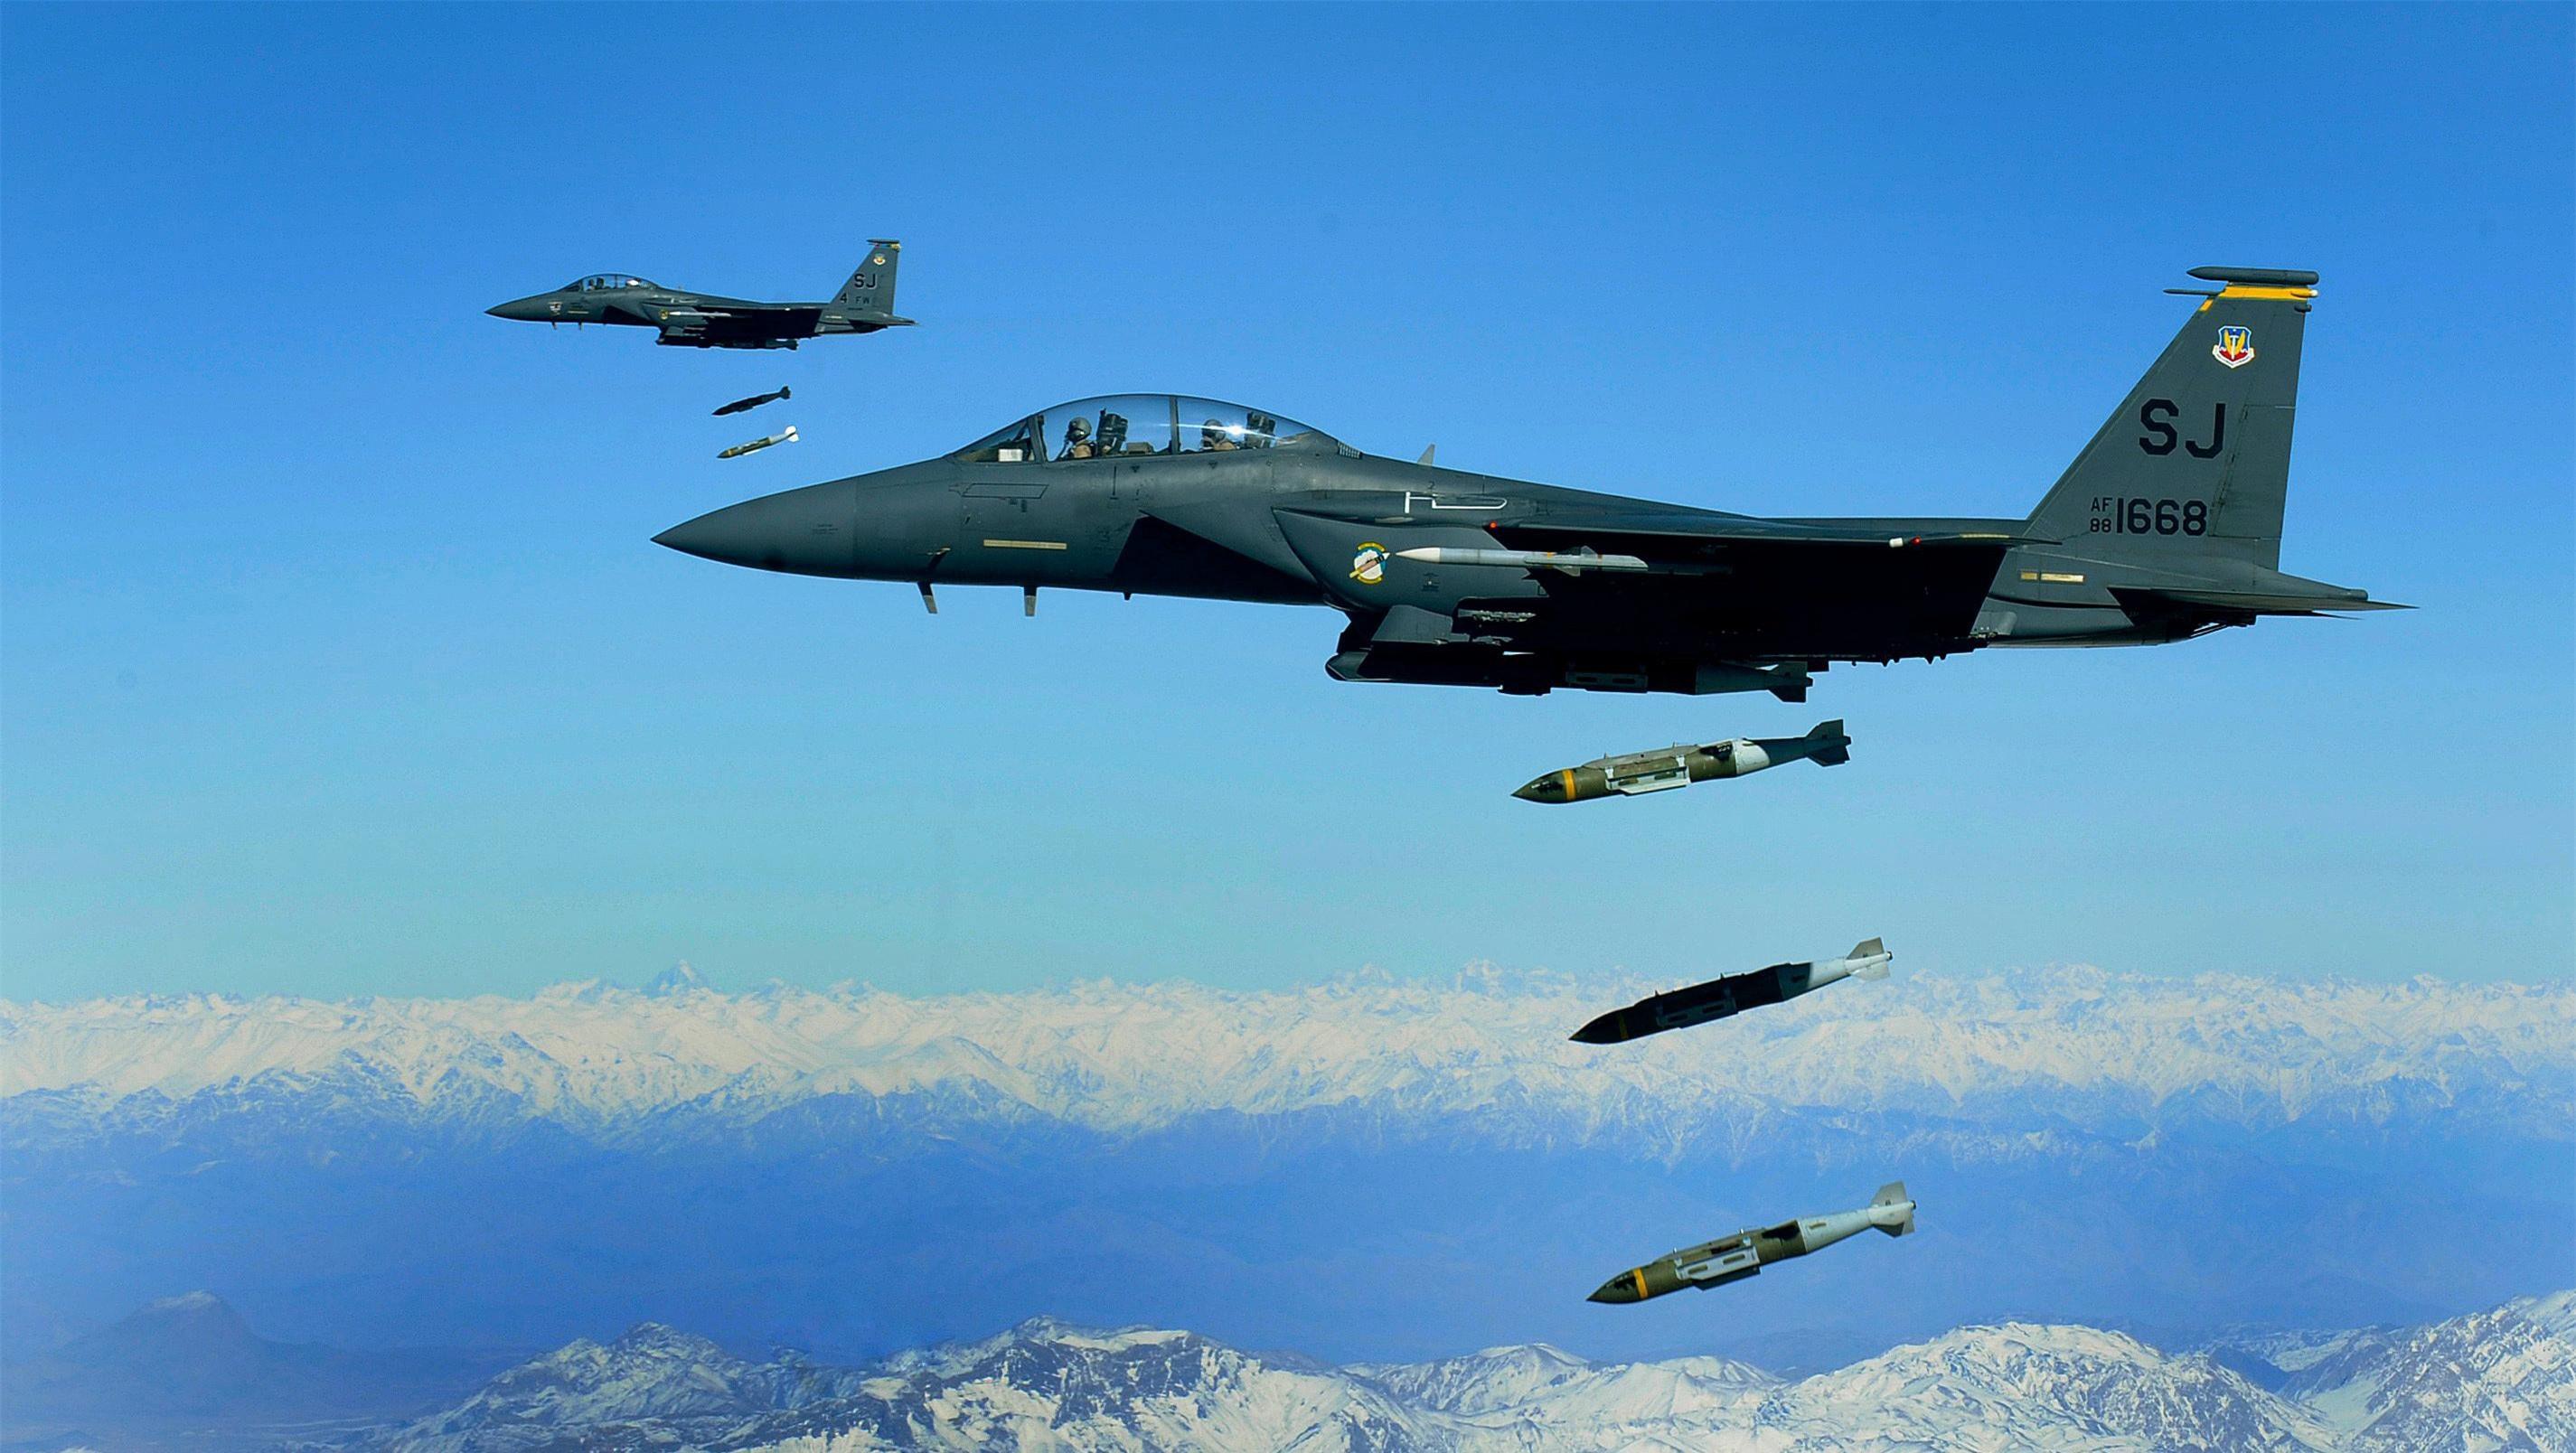 Tiem kich F-15E cua My manh ngang may bay nem bom chien luoc Trung Quoc-Hinh-17